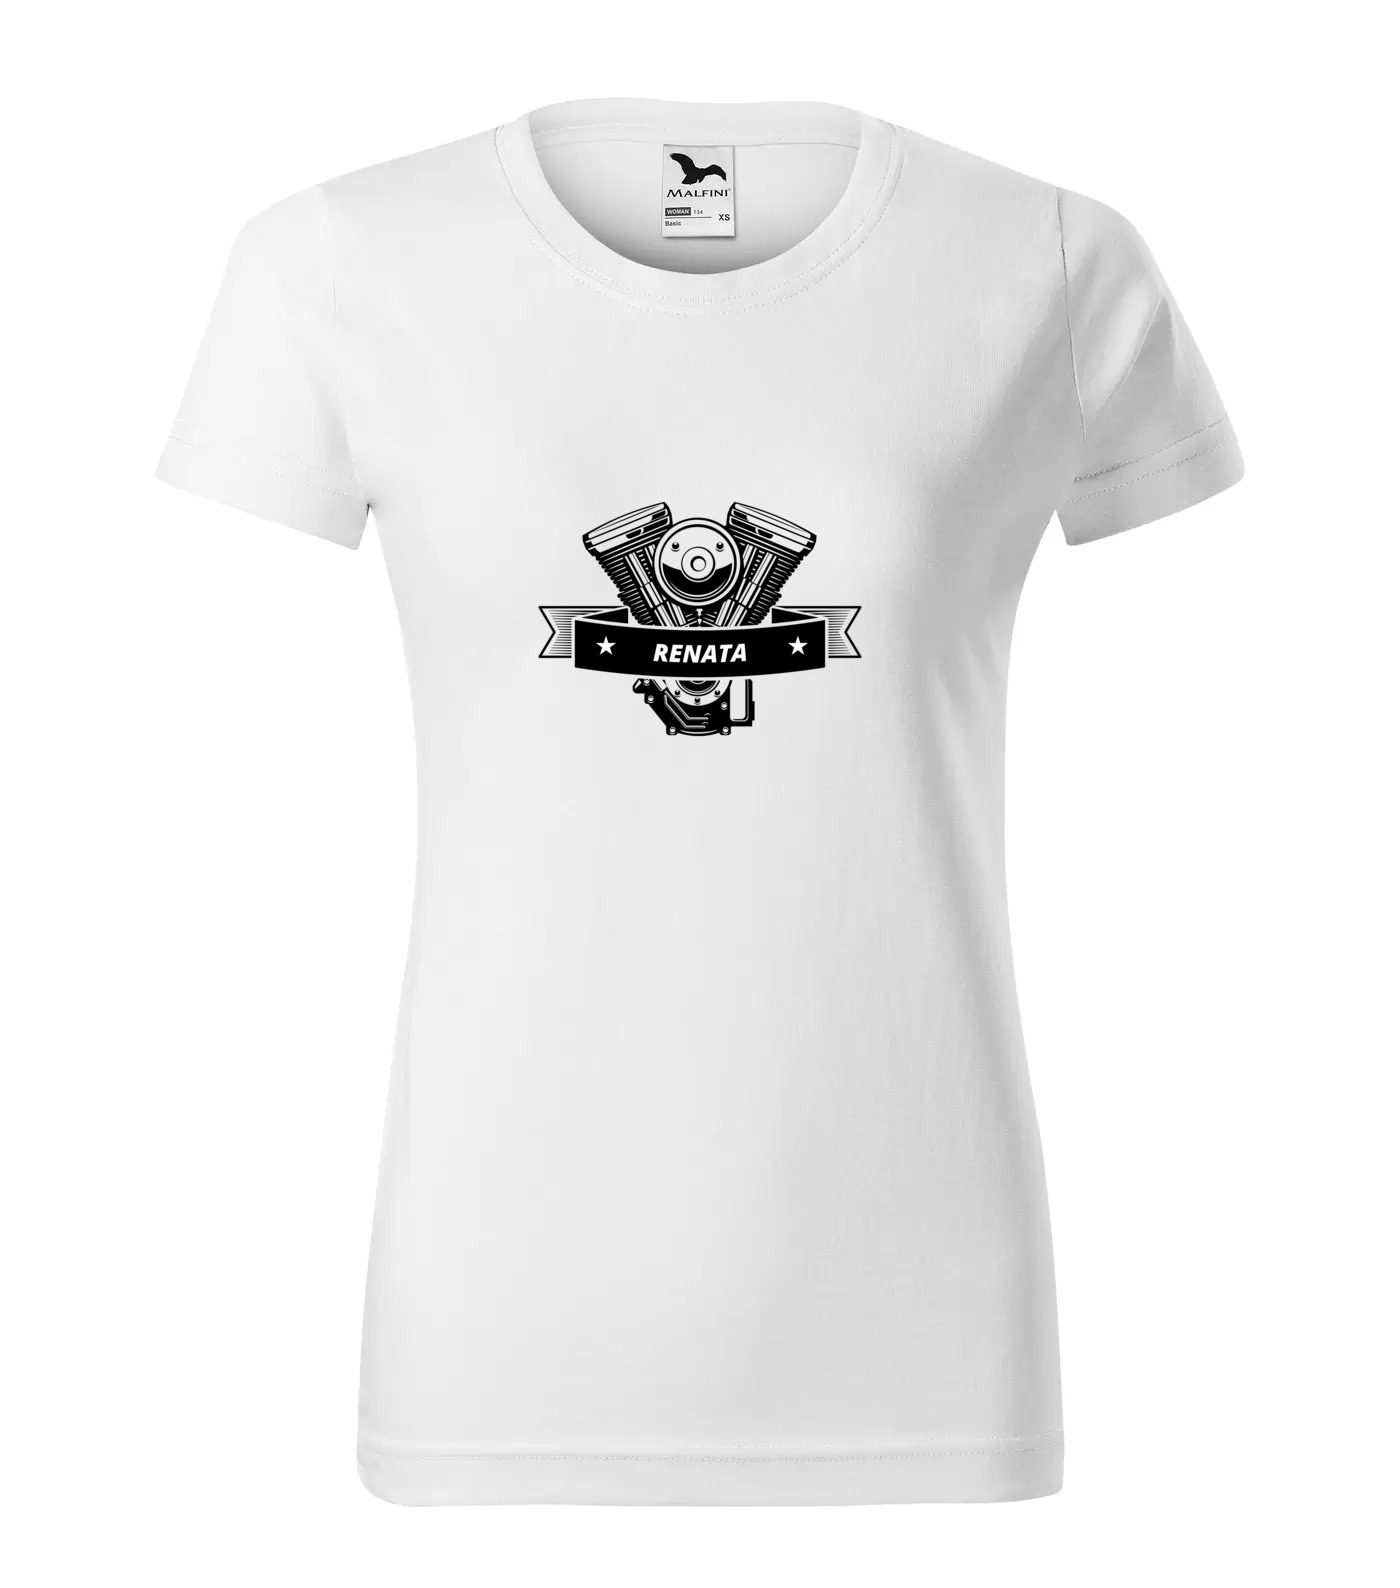 Tričko Motorkářka Renata